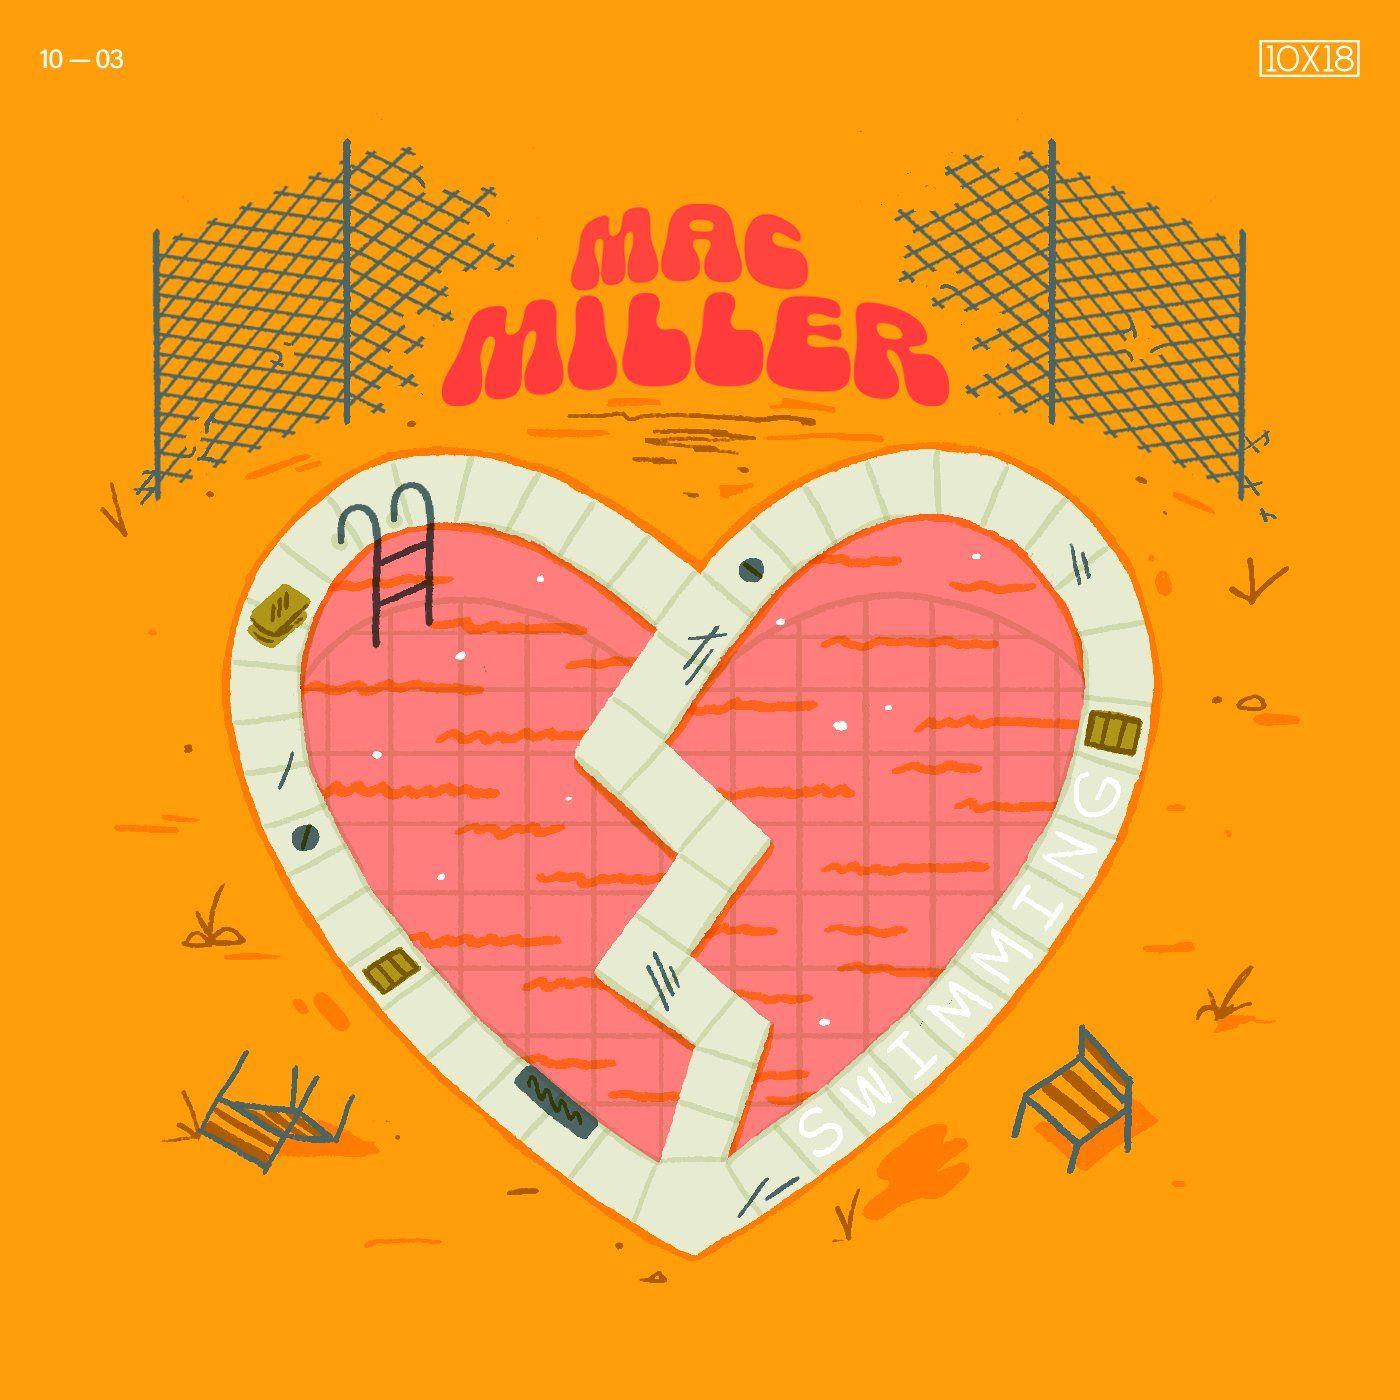 Day 3 10x18 Mac miller, Album covers